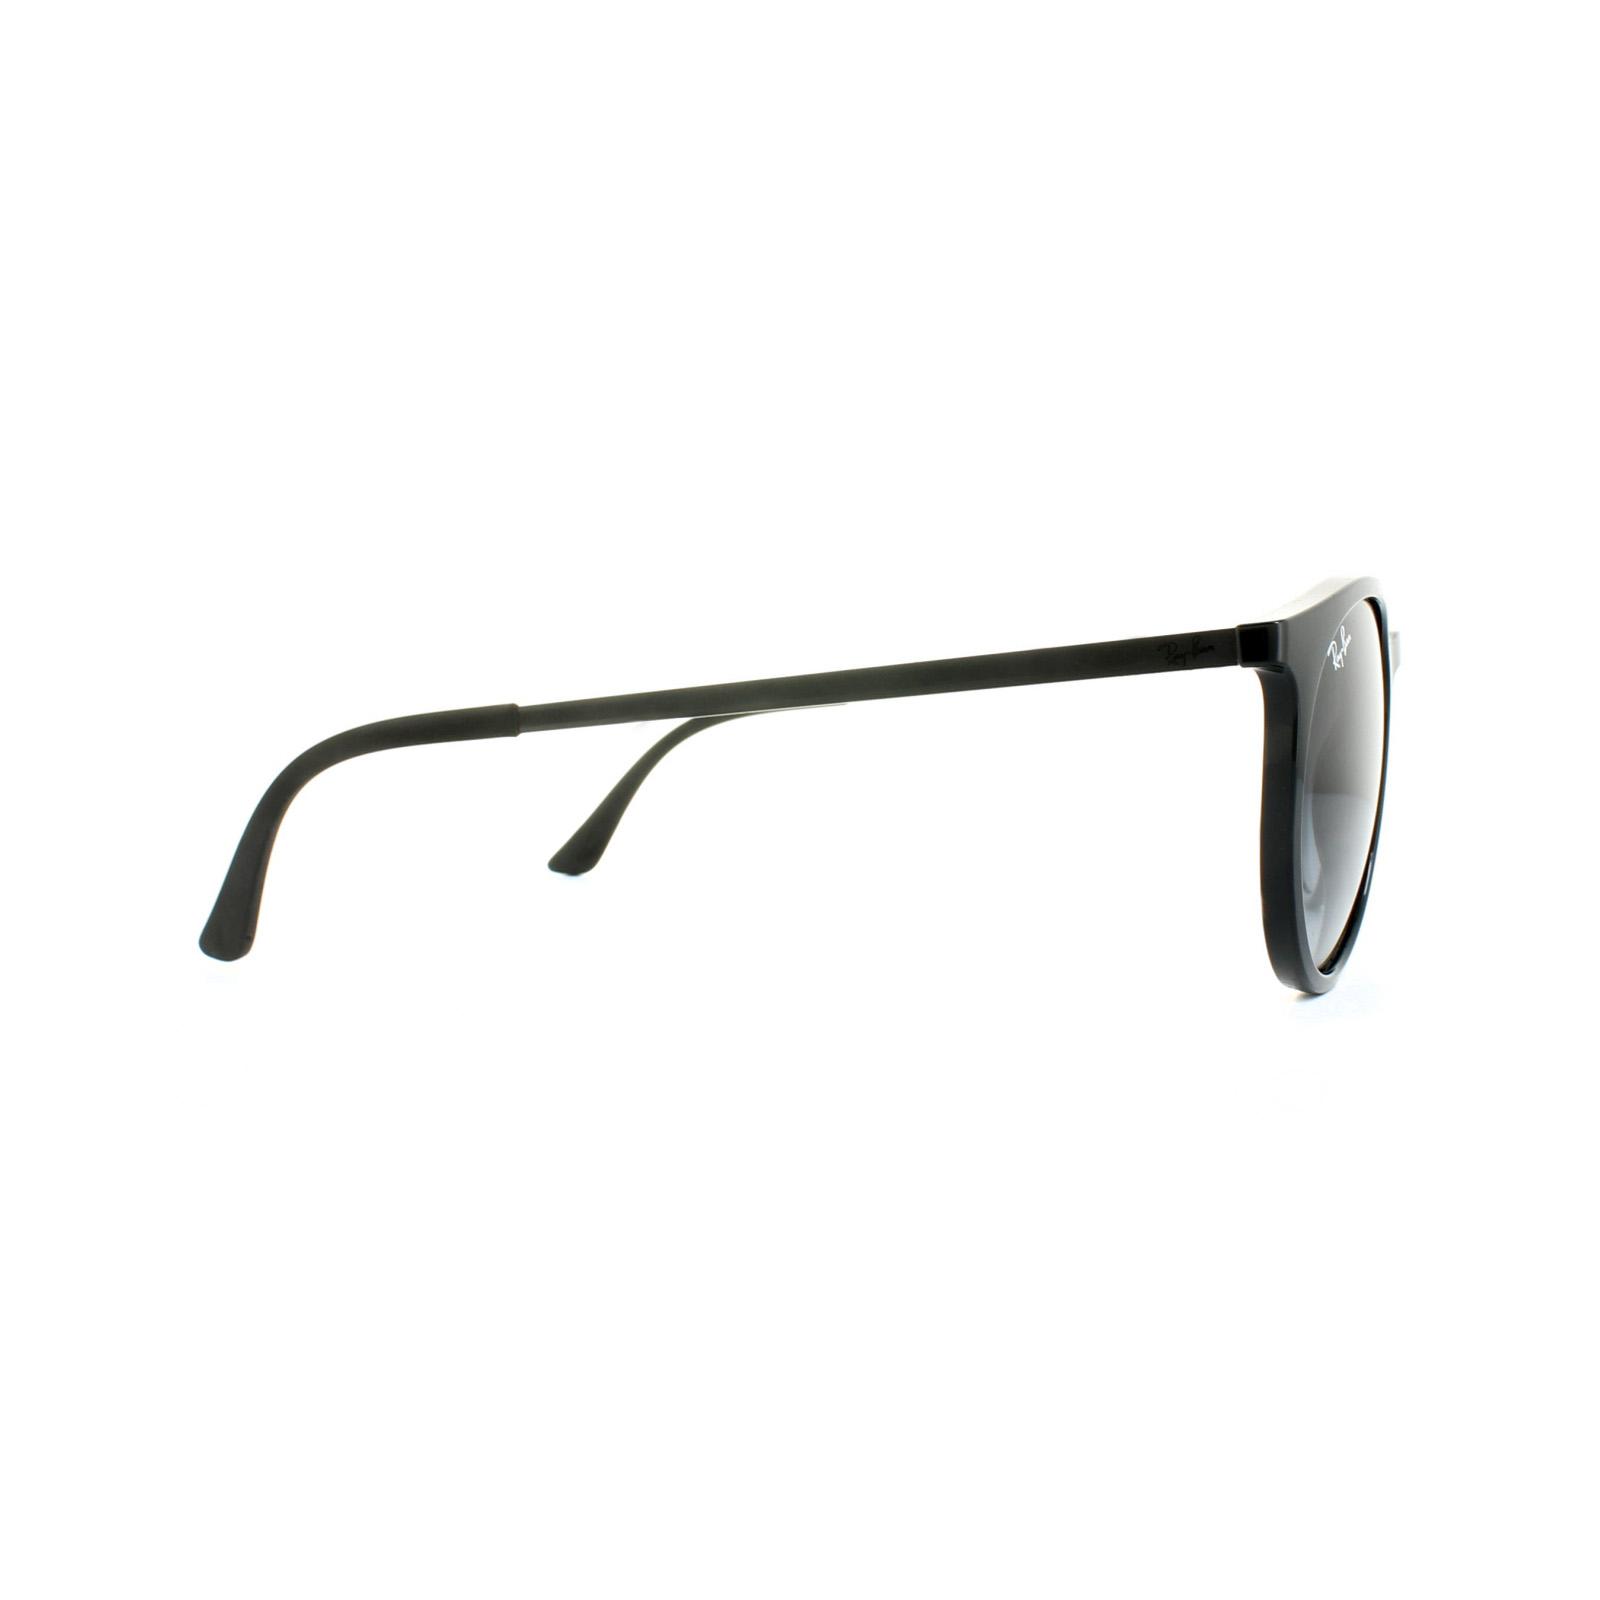 a298481b82 Ray-Ban Sunglasses 4274 601 8G Black Grey Gradient 8053672673722